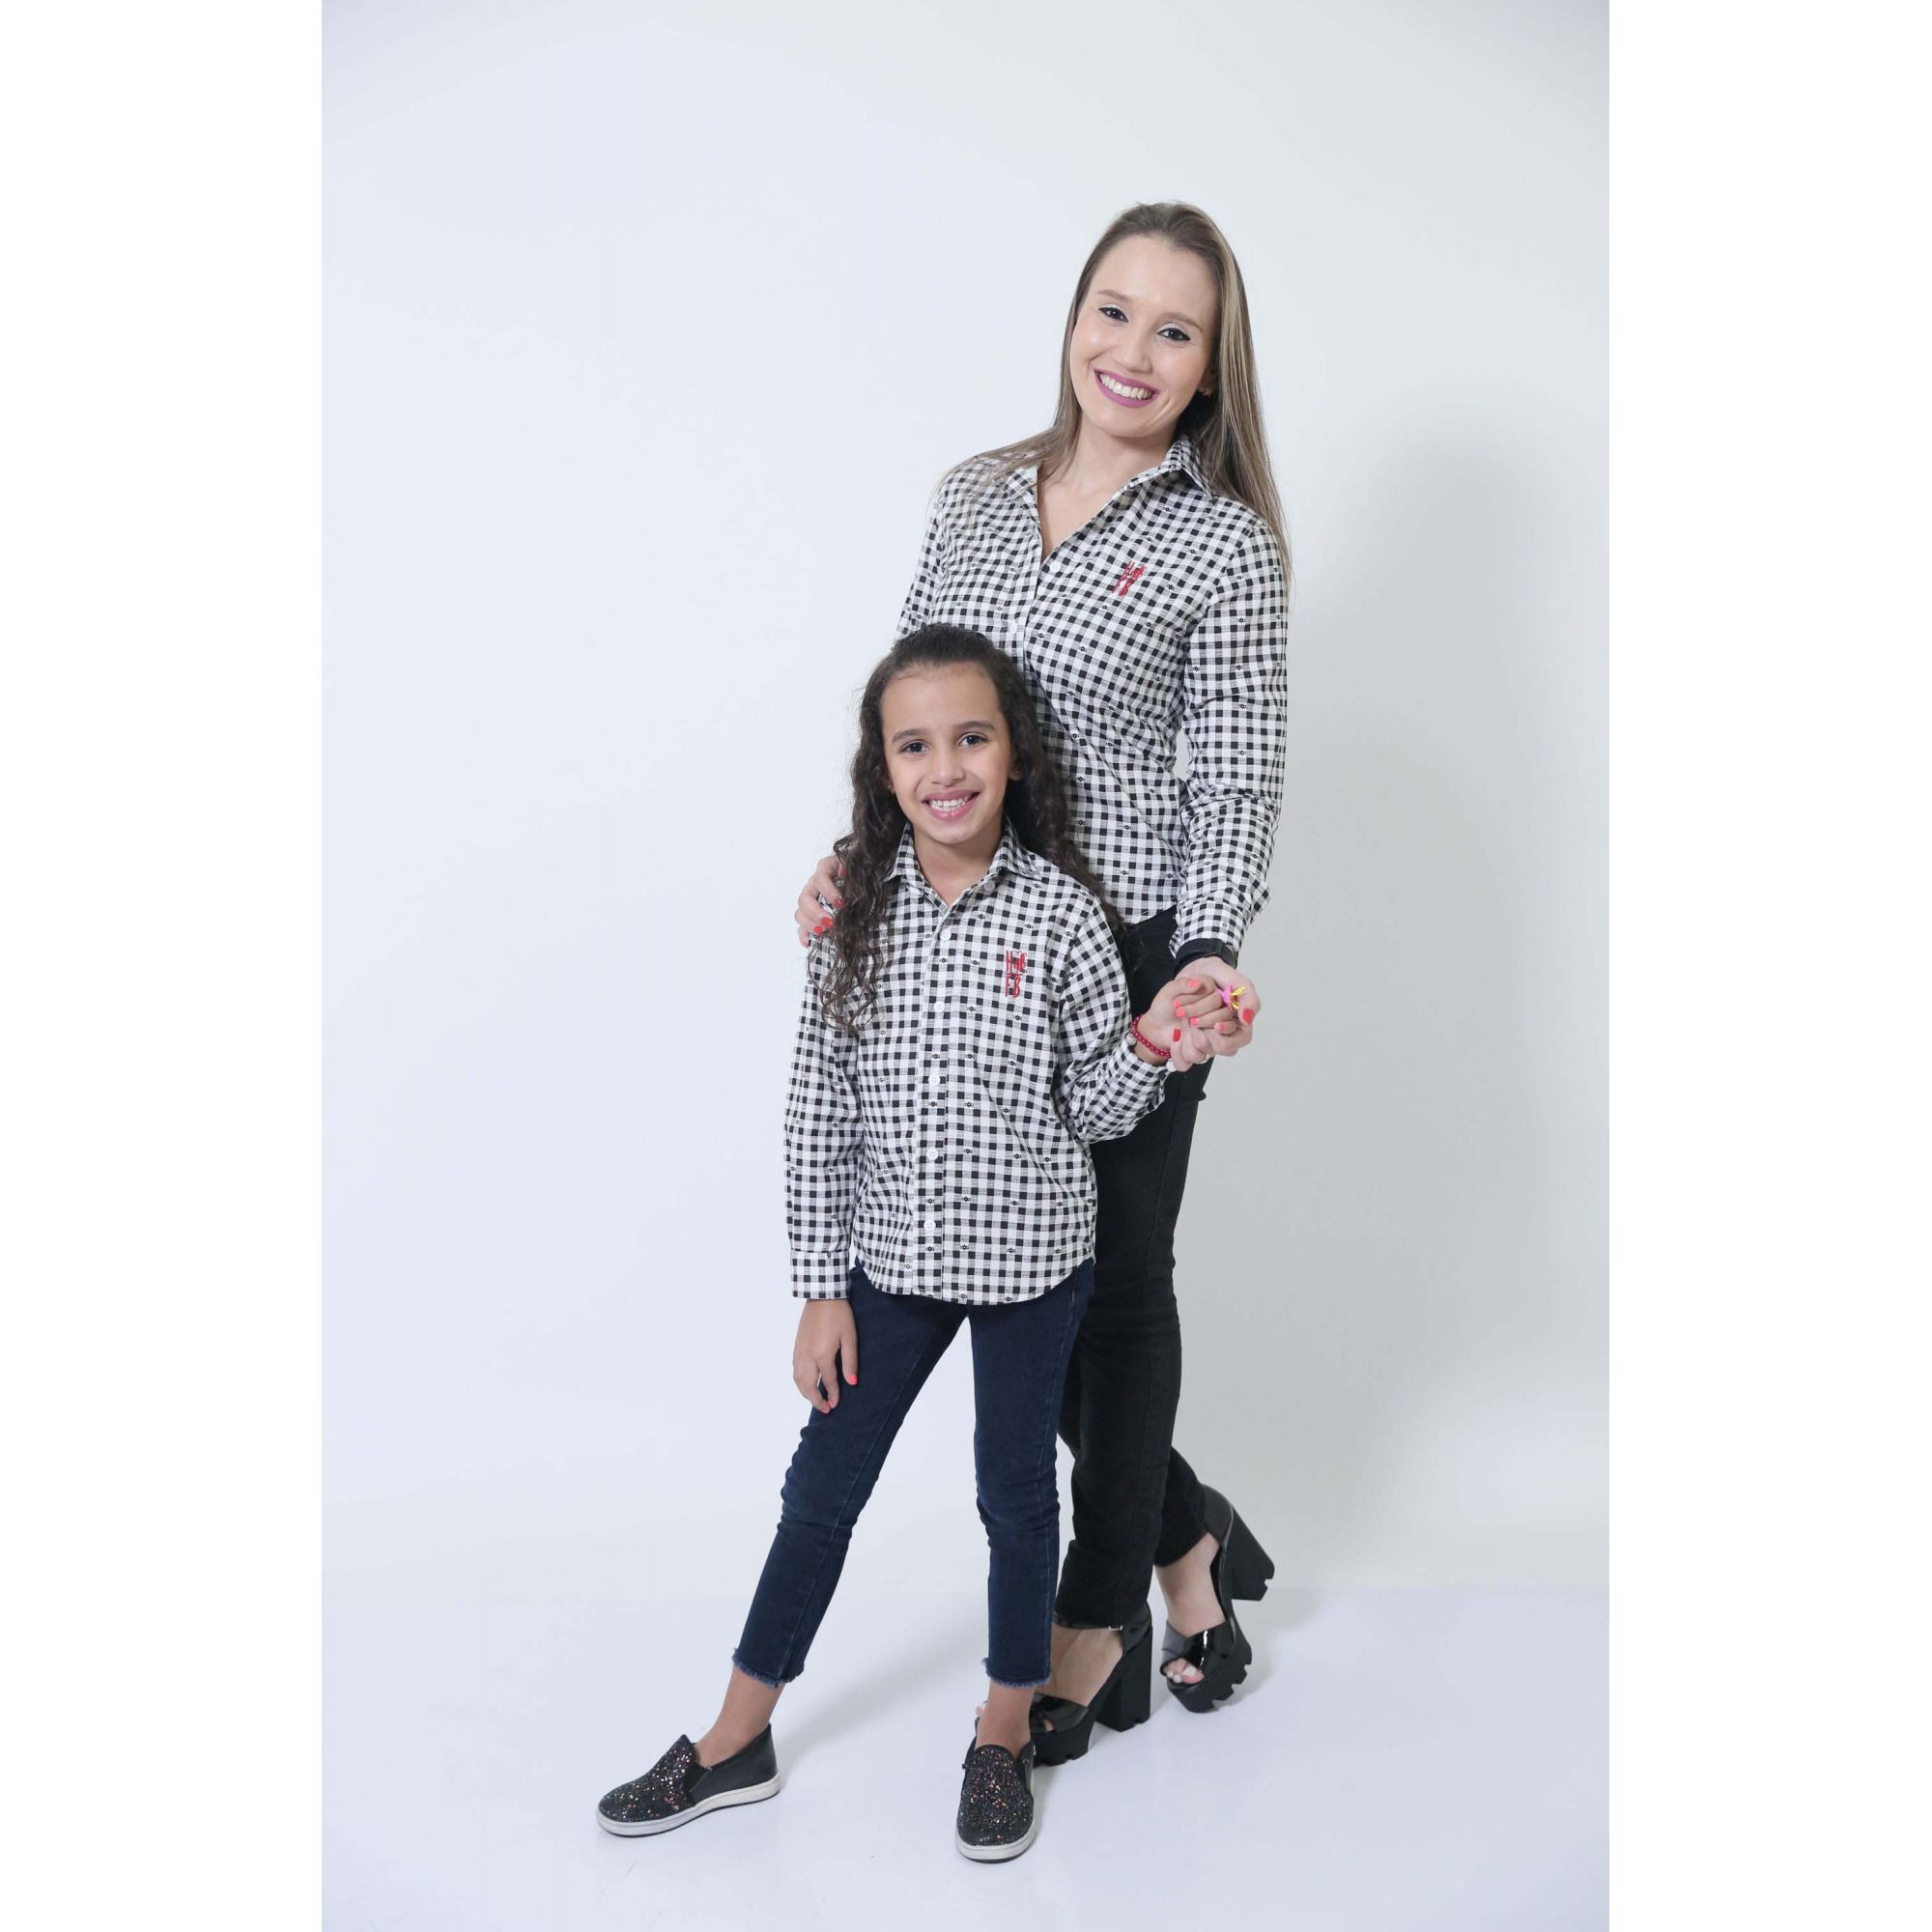 MÃE E FILHOS > Kit 02 Camisas Social Xadrez Dama [Coleção Tal Mãe Tal Filho]  - Heitor Fashion Brazil